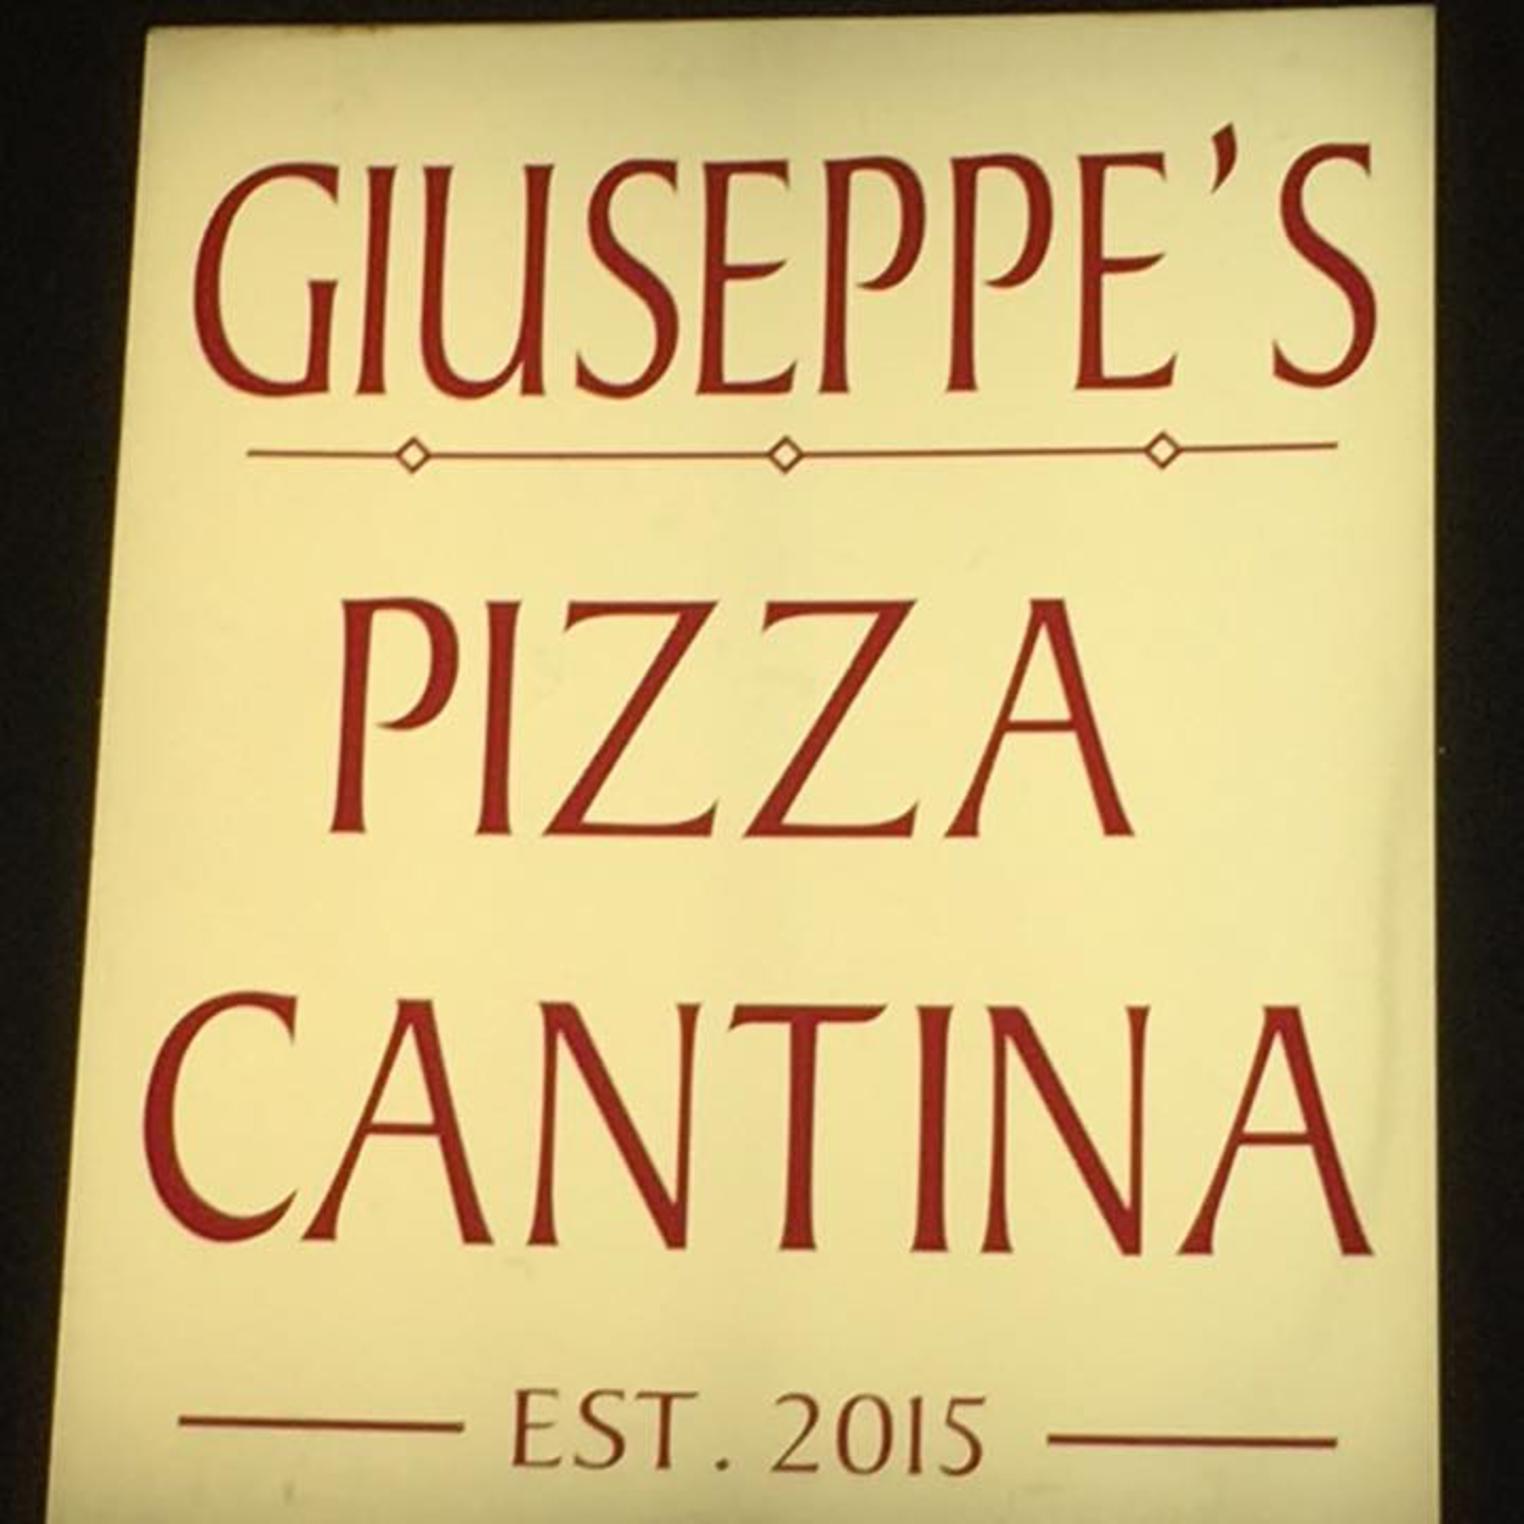 Giuseppe's Pizza Cantina